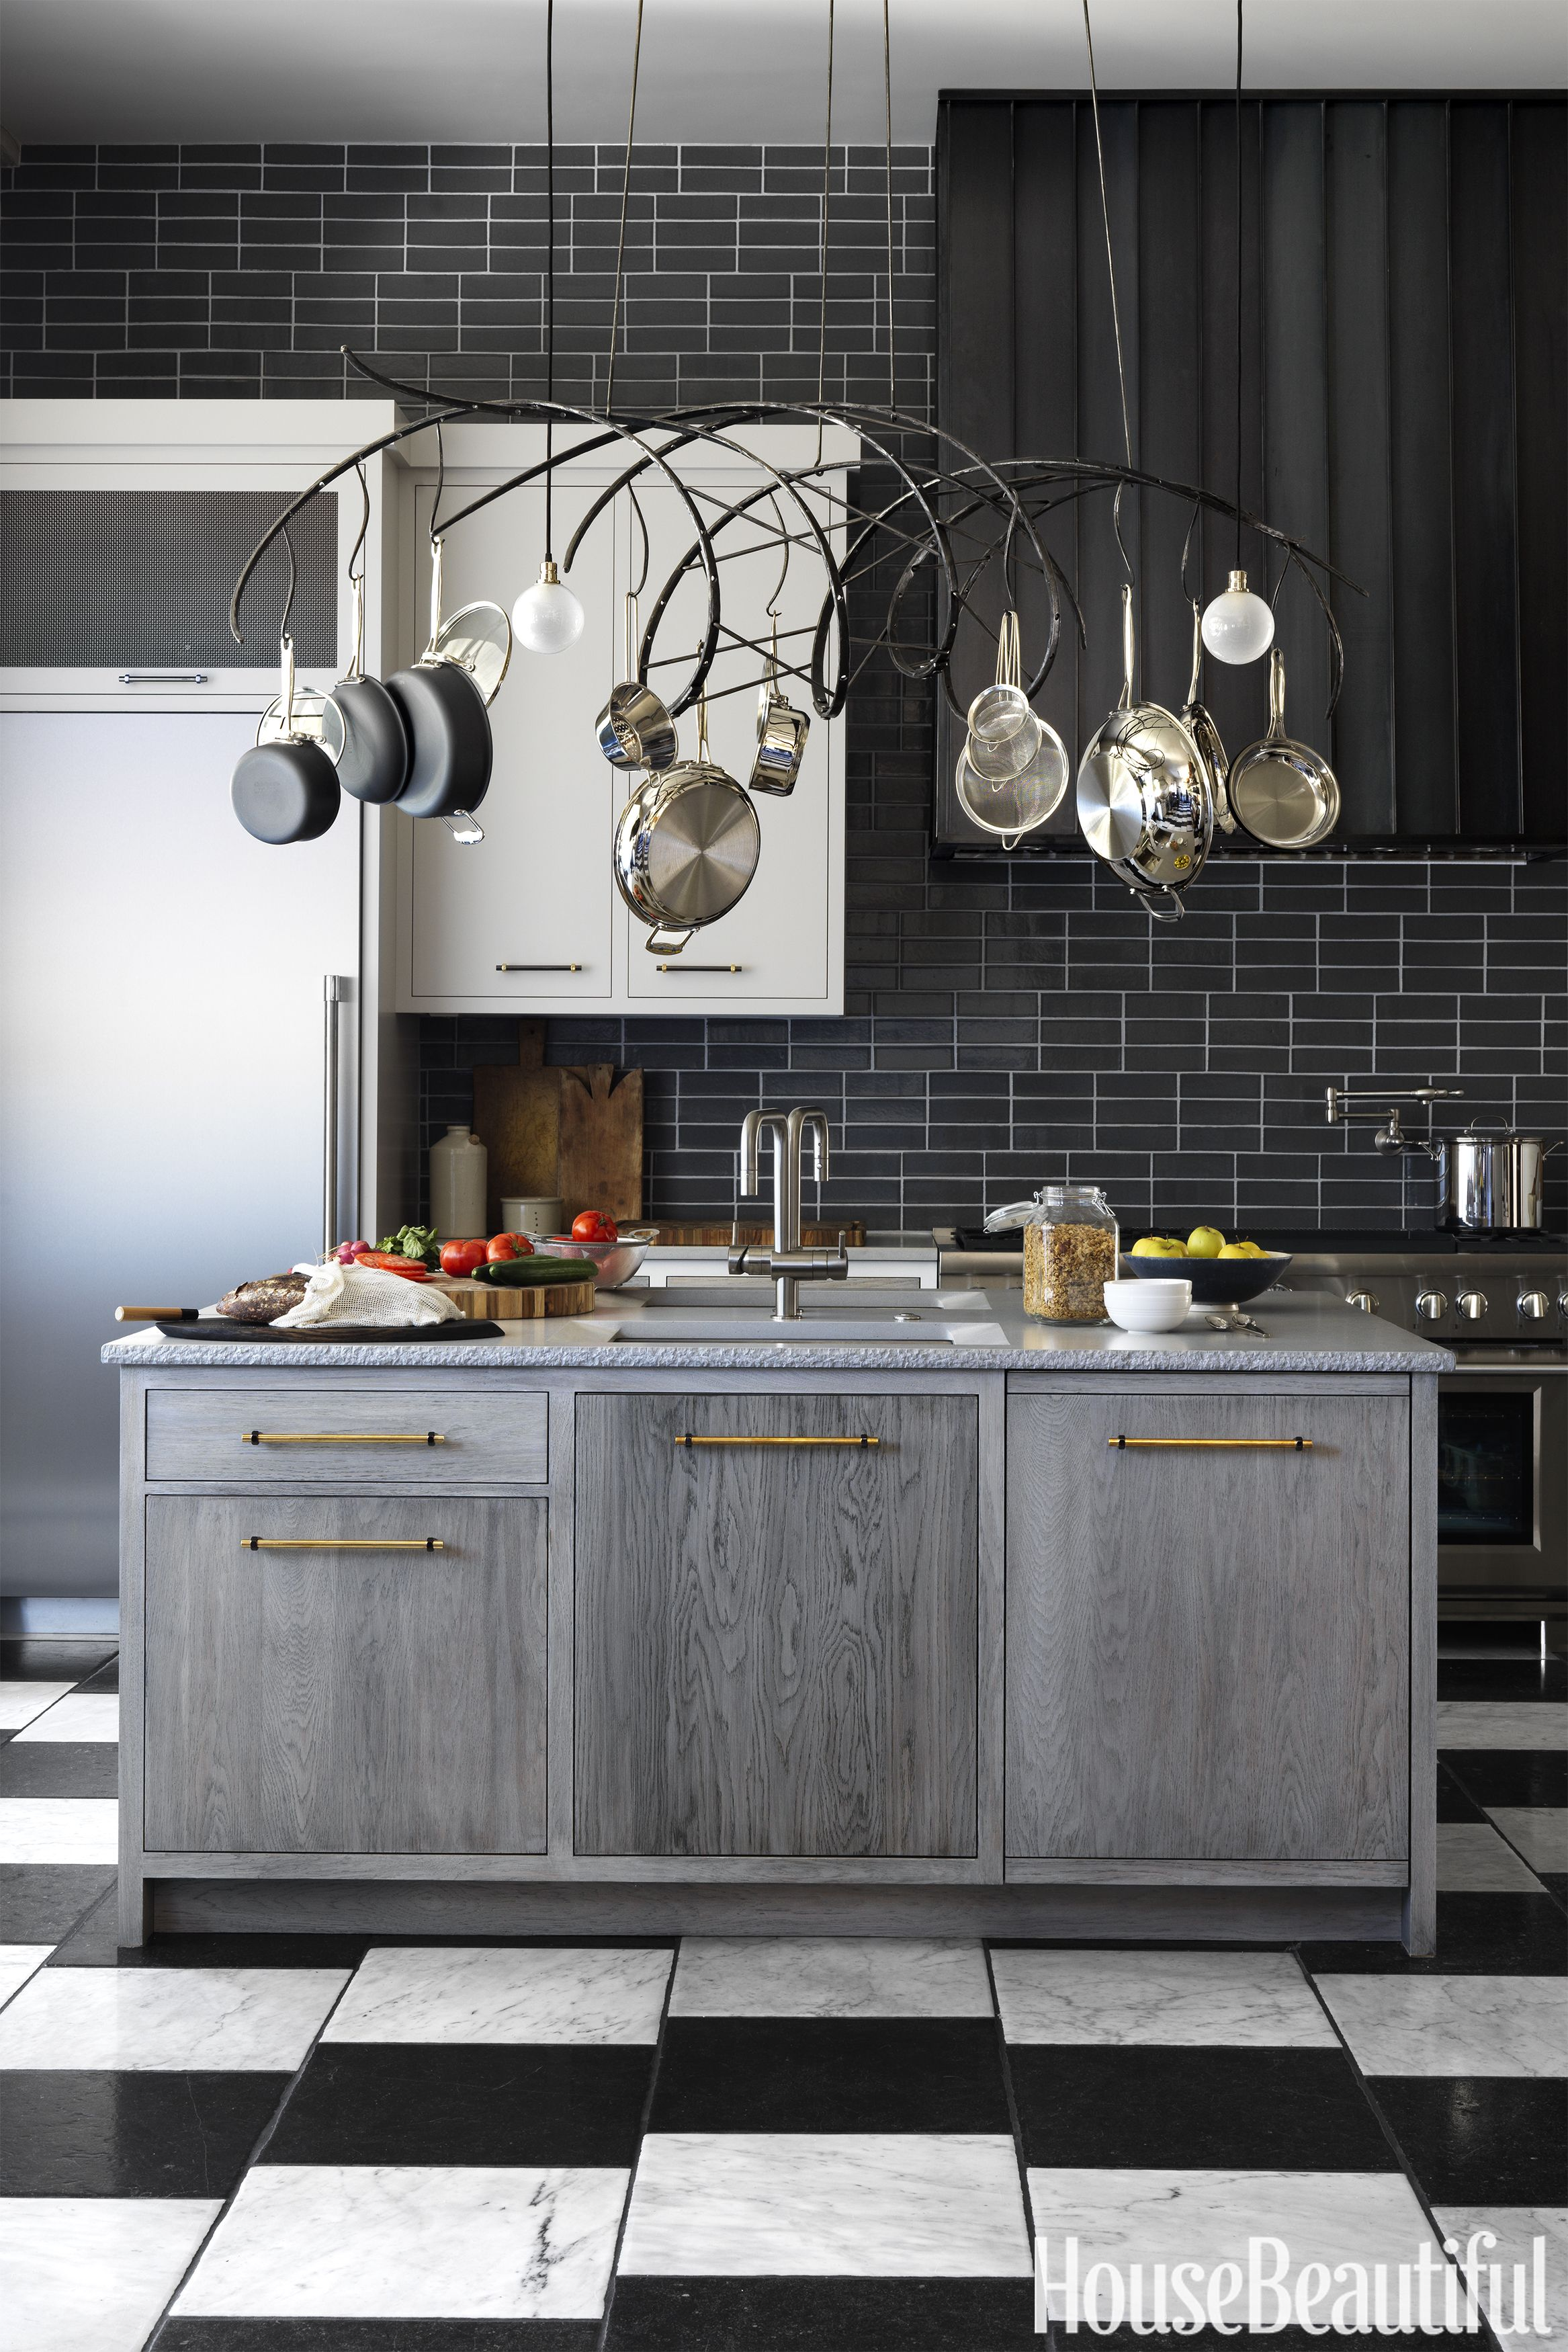 jon de la cruz kitchen of the year kitchen island & Best Kitchen Backsplash Ideas - Tile Designs for Kitchen Backsplashes